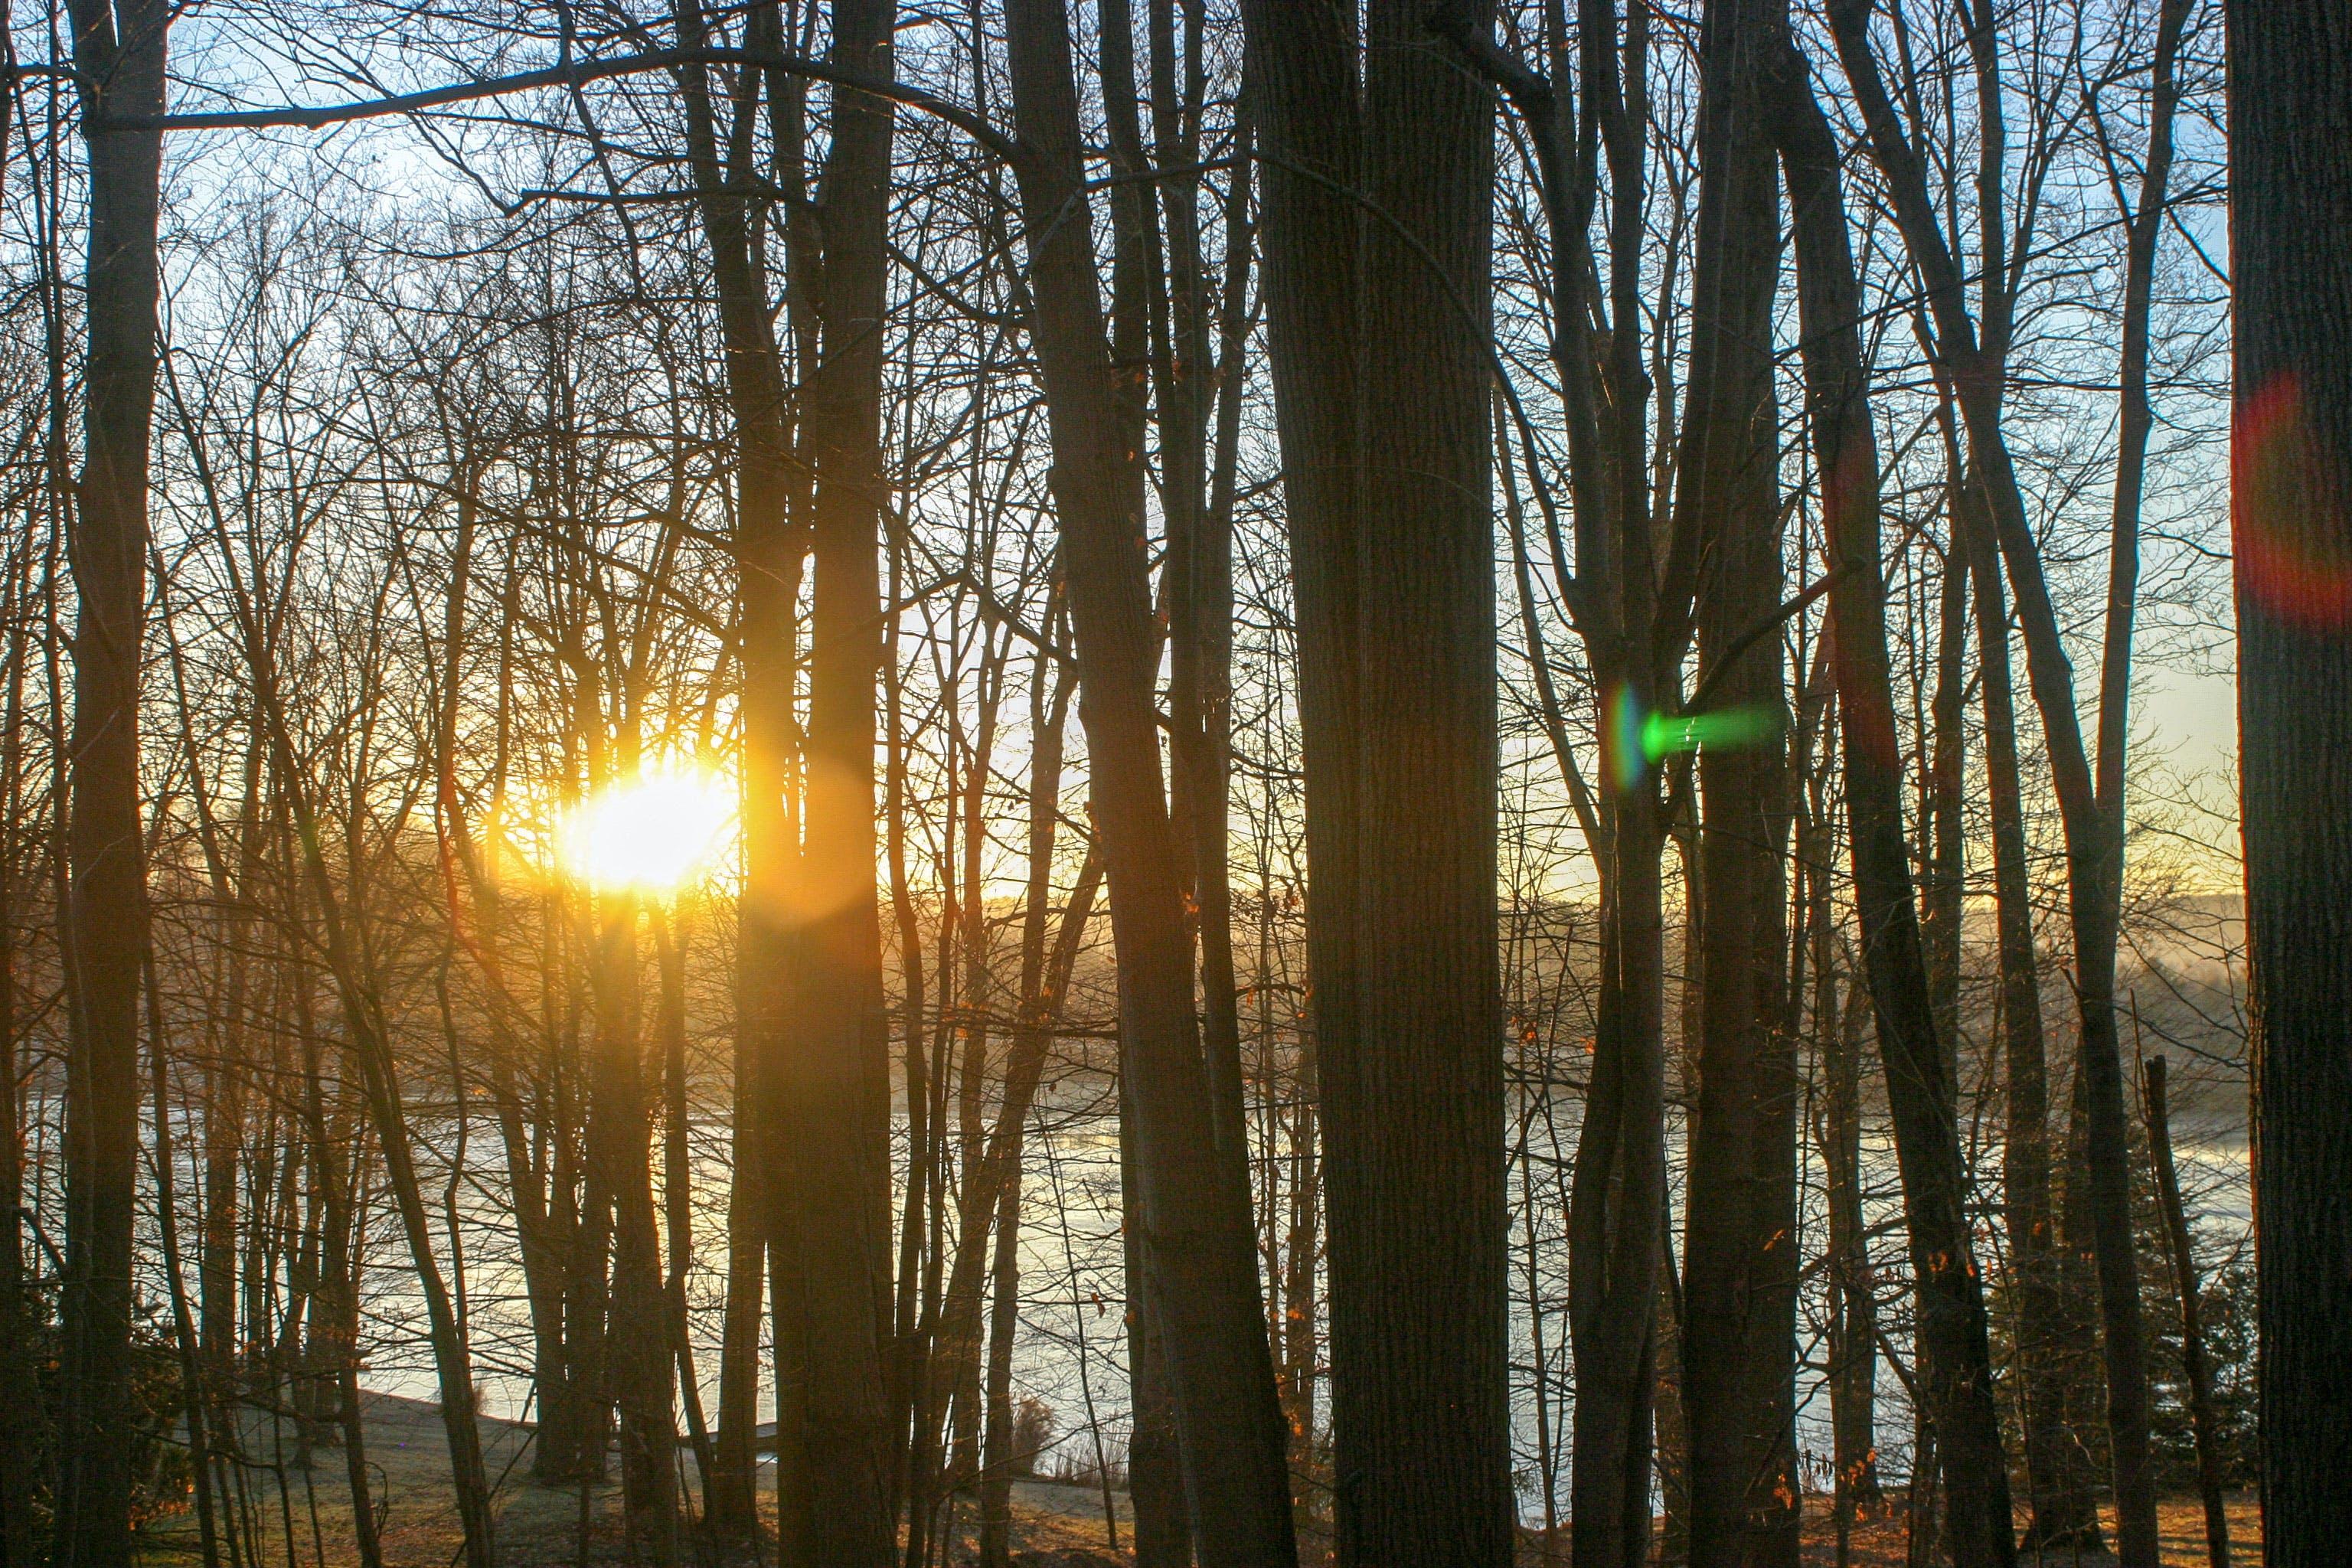 Kostenloses Stock Foto zu bäume, draussen, sonnenaufgang, sonnenuntergang